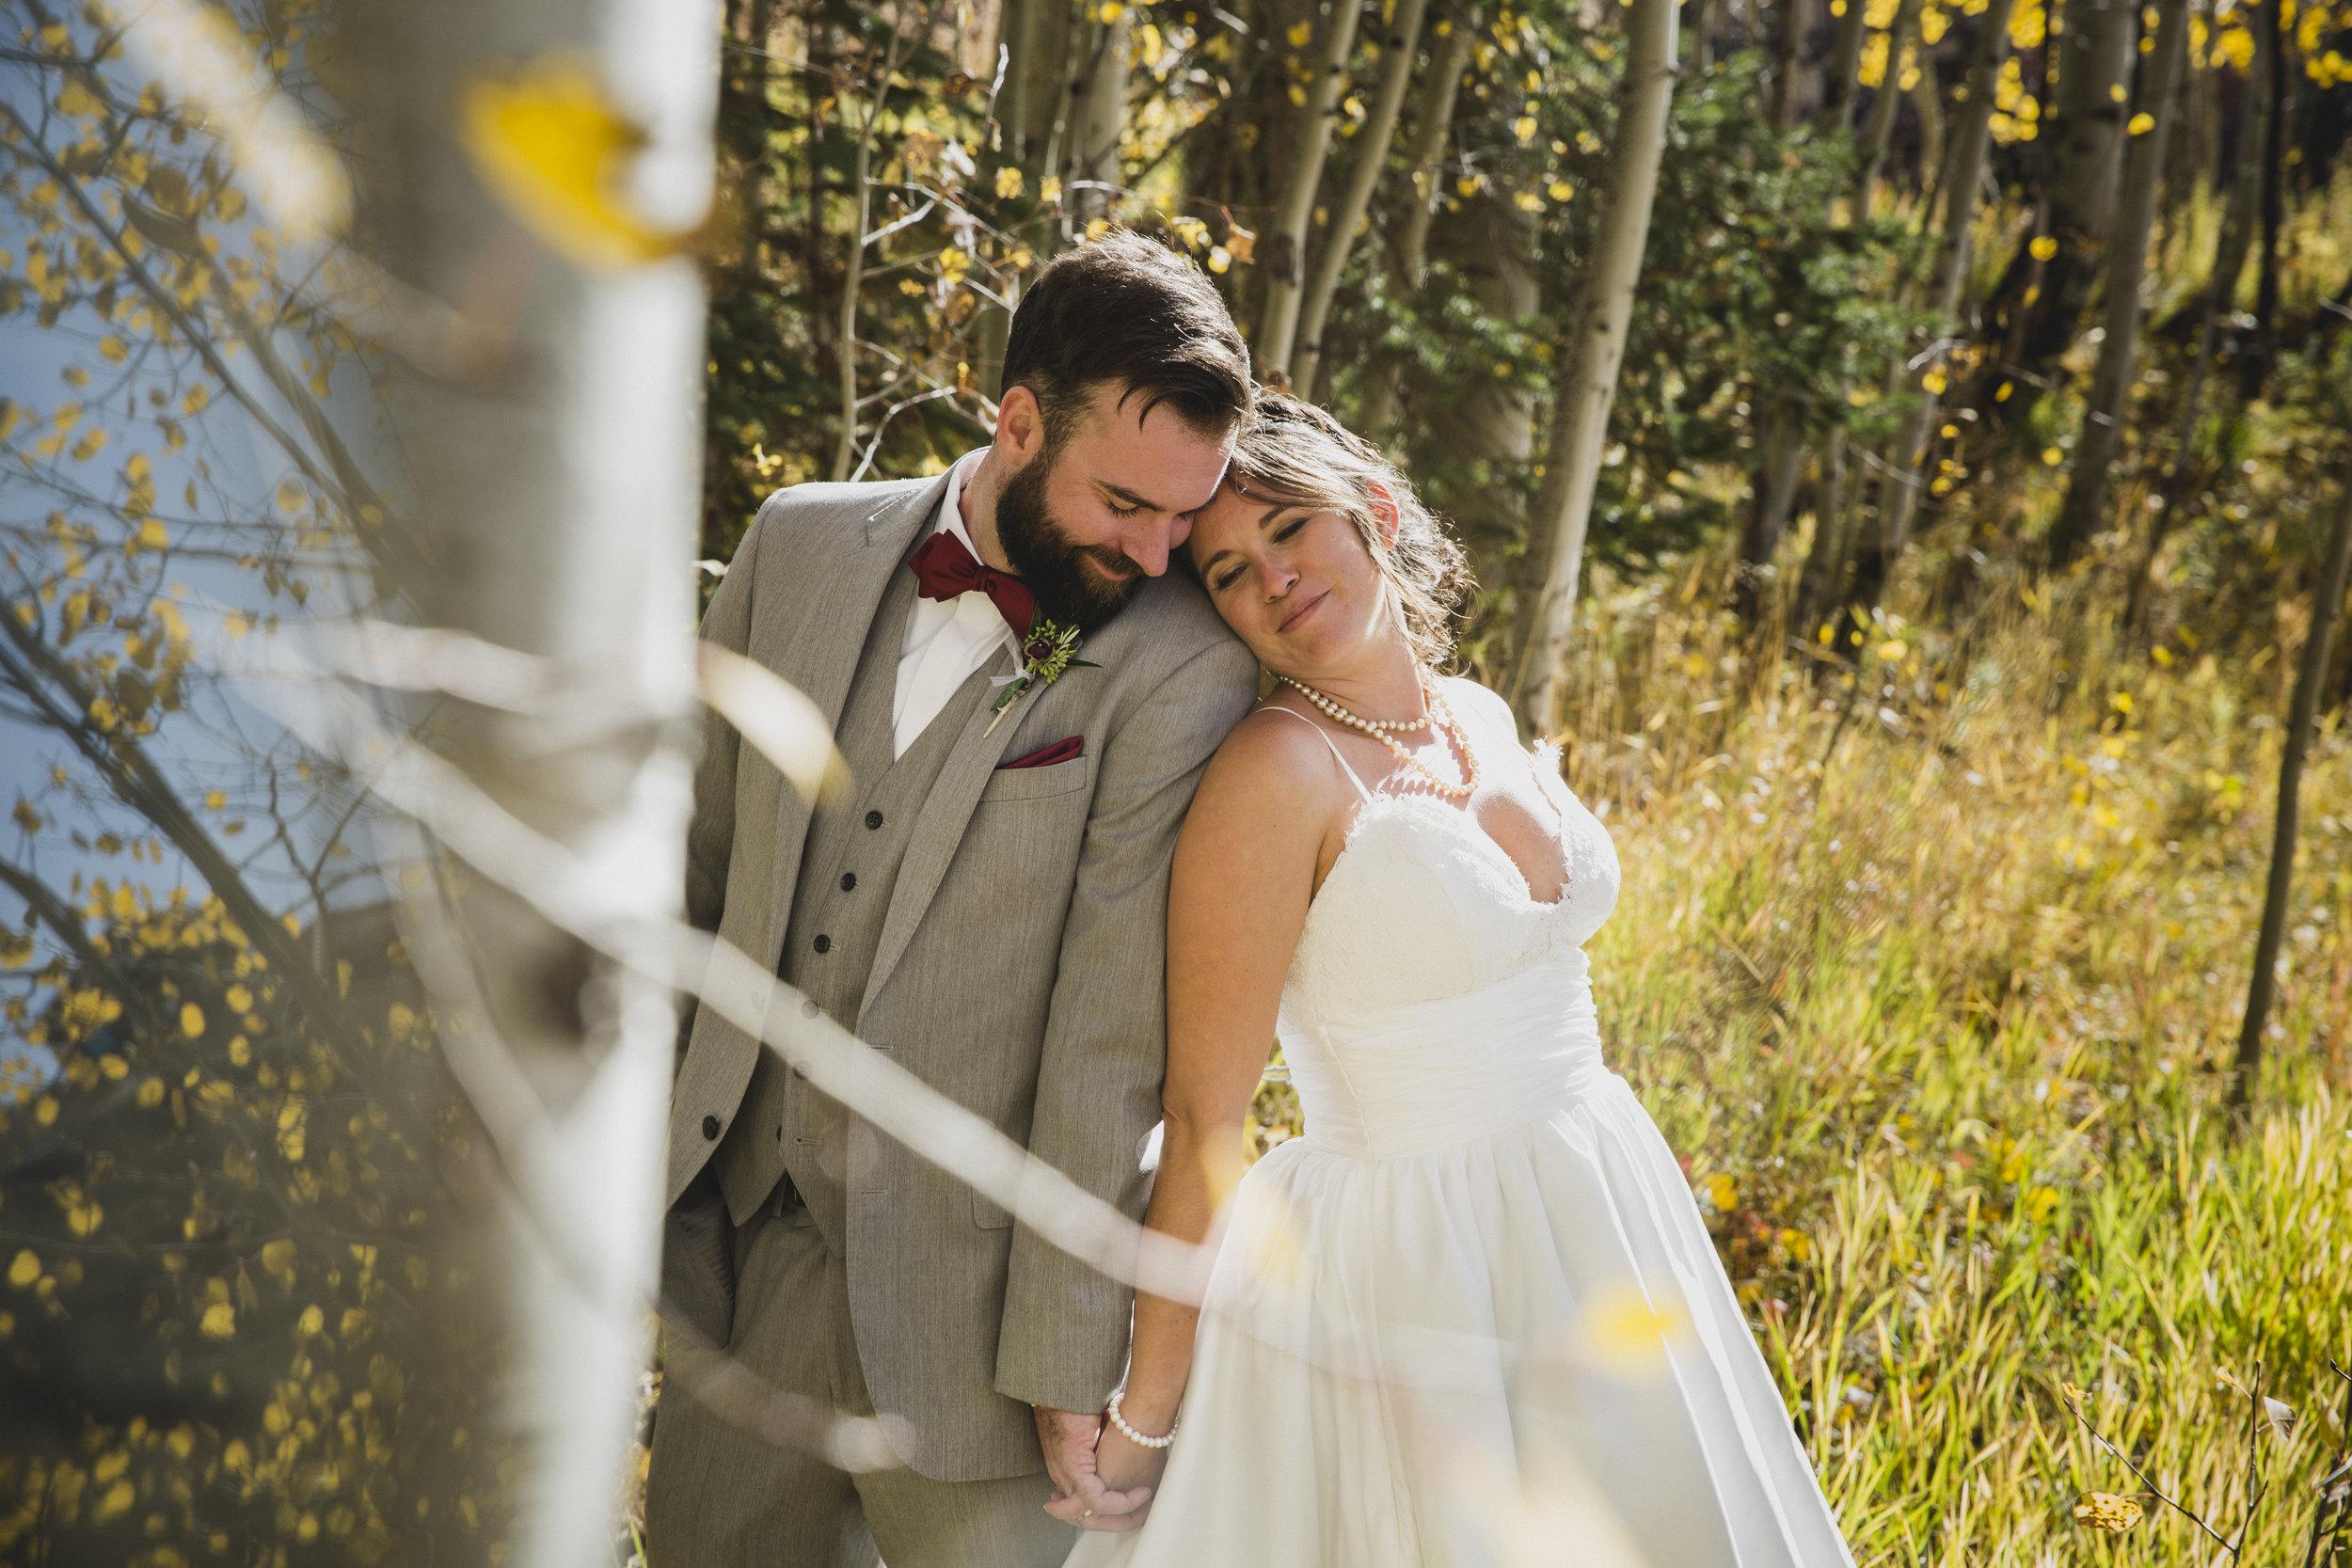 NE-LeahandAshtonphotography-Telluride-Wedding-Photography-9842.jpg